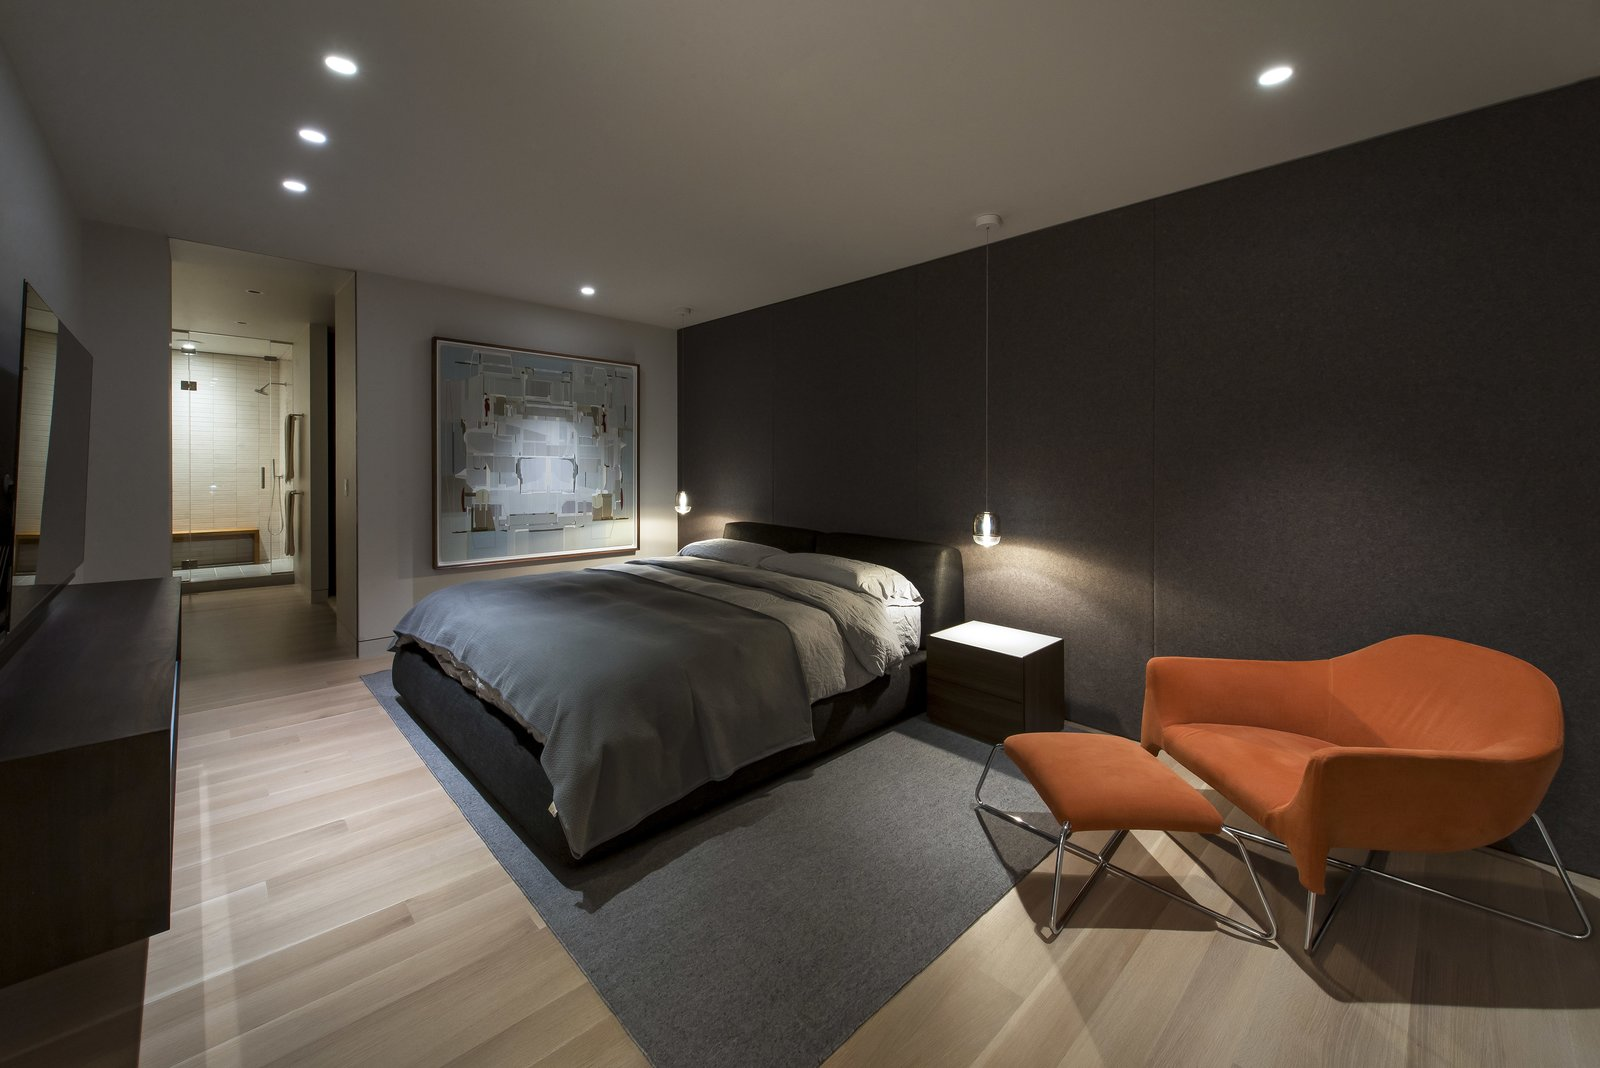 Master Bedroom - Night  Nob Hill Residence by Imbue Design